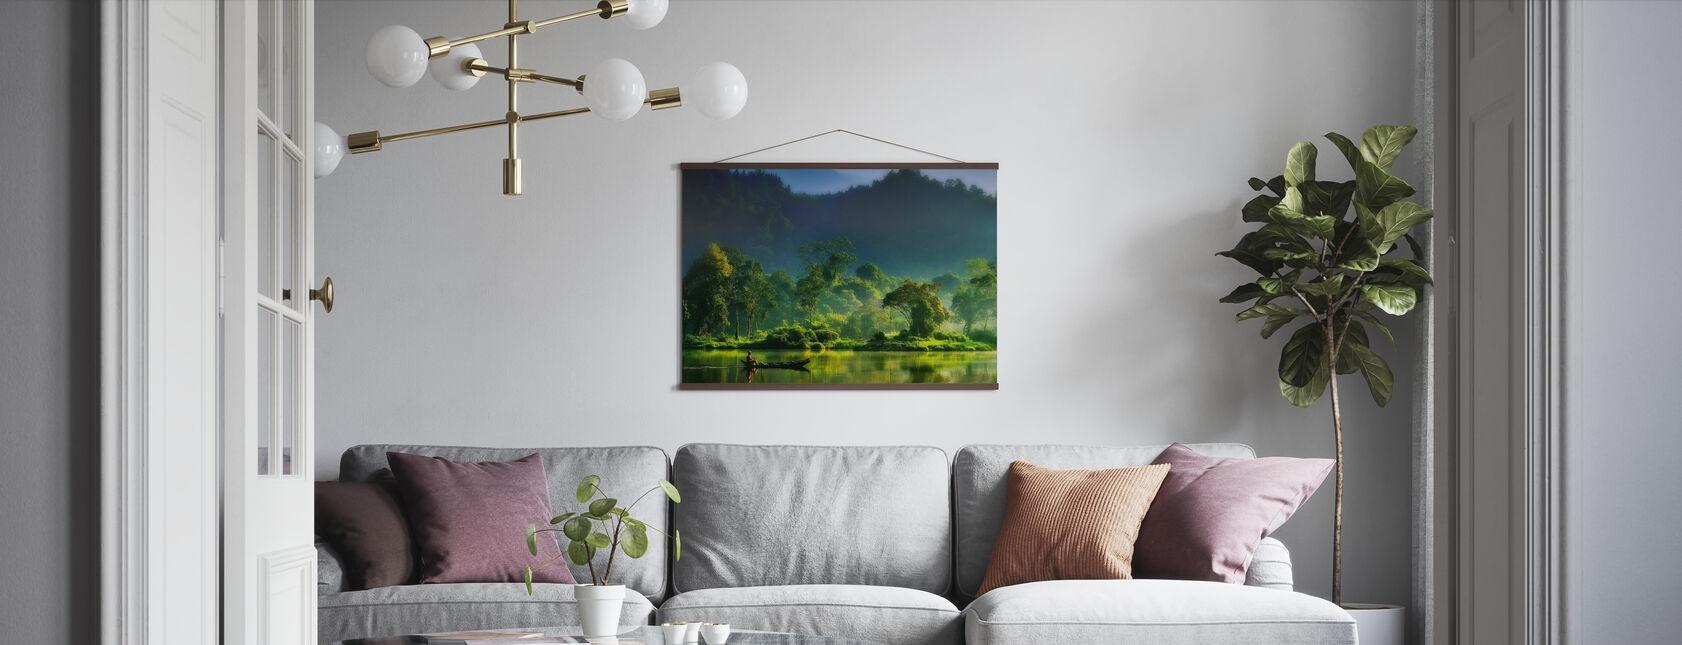 Maleri af naturen - Plakat - Stue